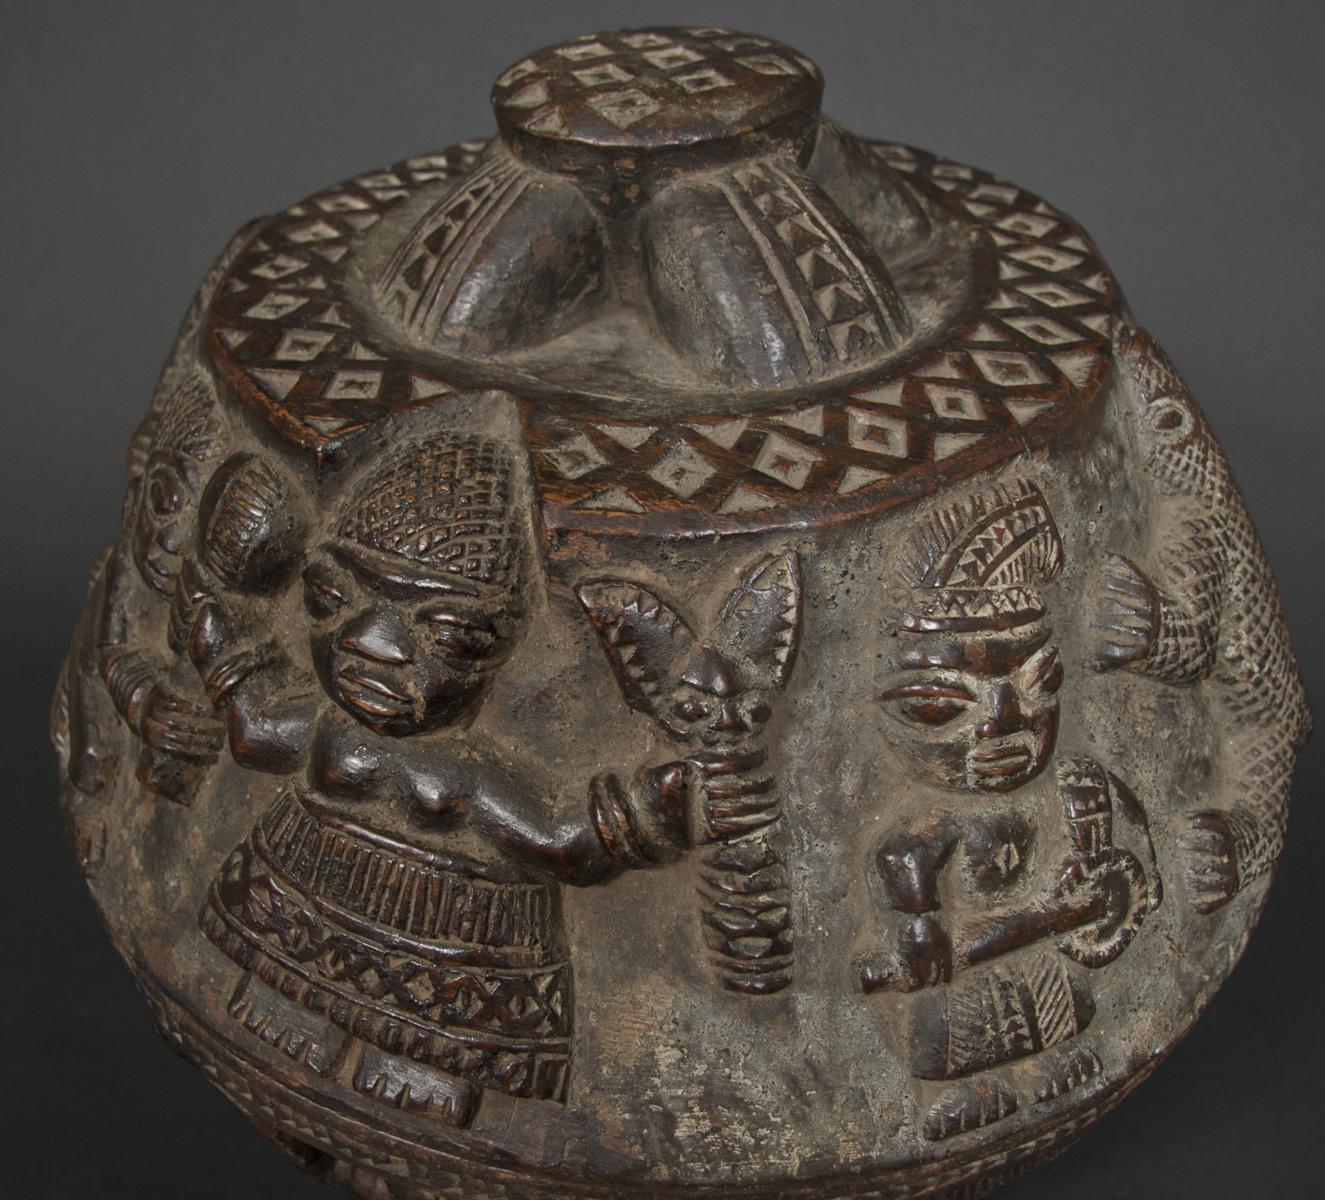 Ifa divination bowl yoruba galerie flak for Yoruba architecture